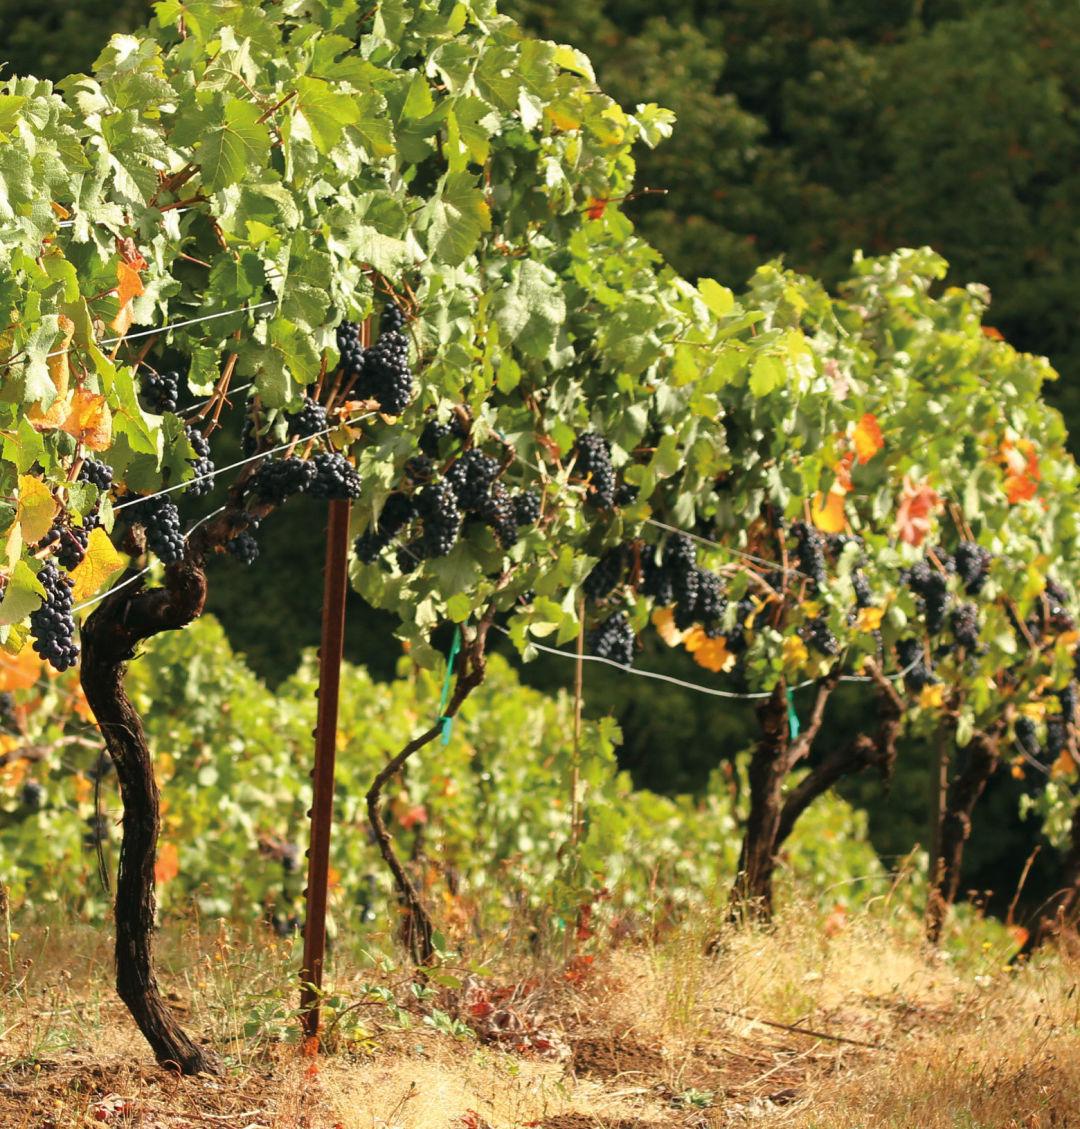 0416 teutonic winery borgopass wsb6qo